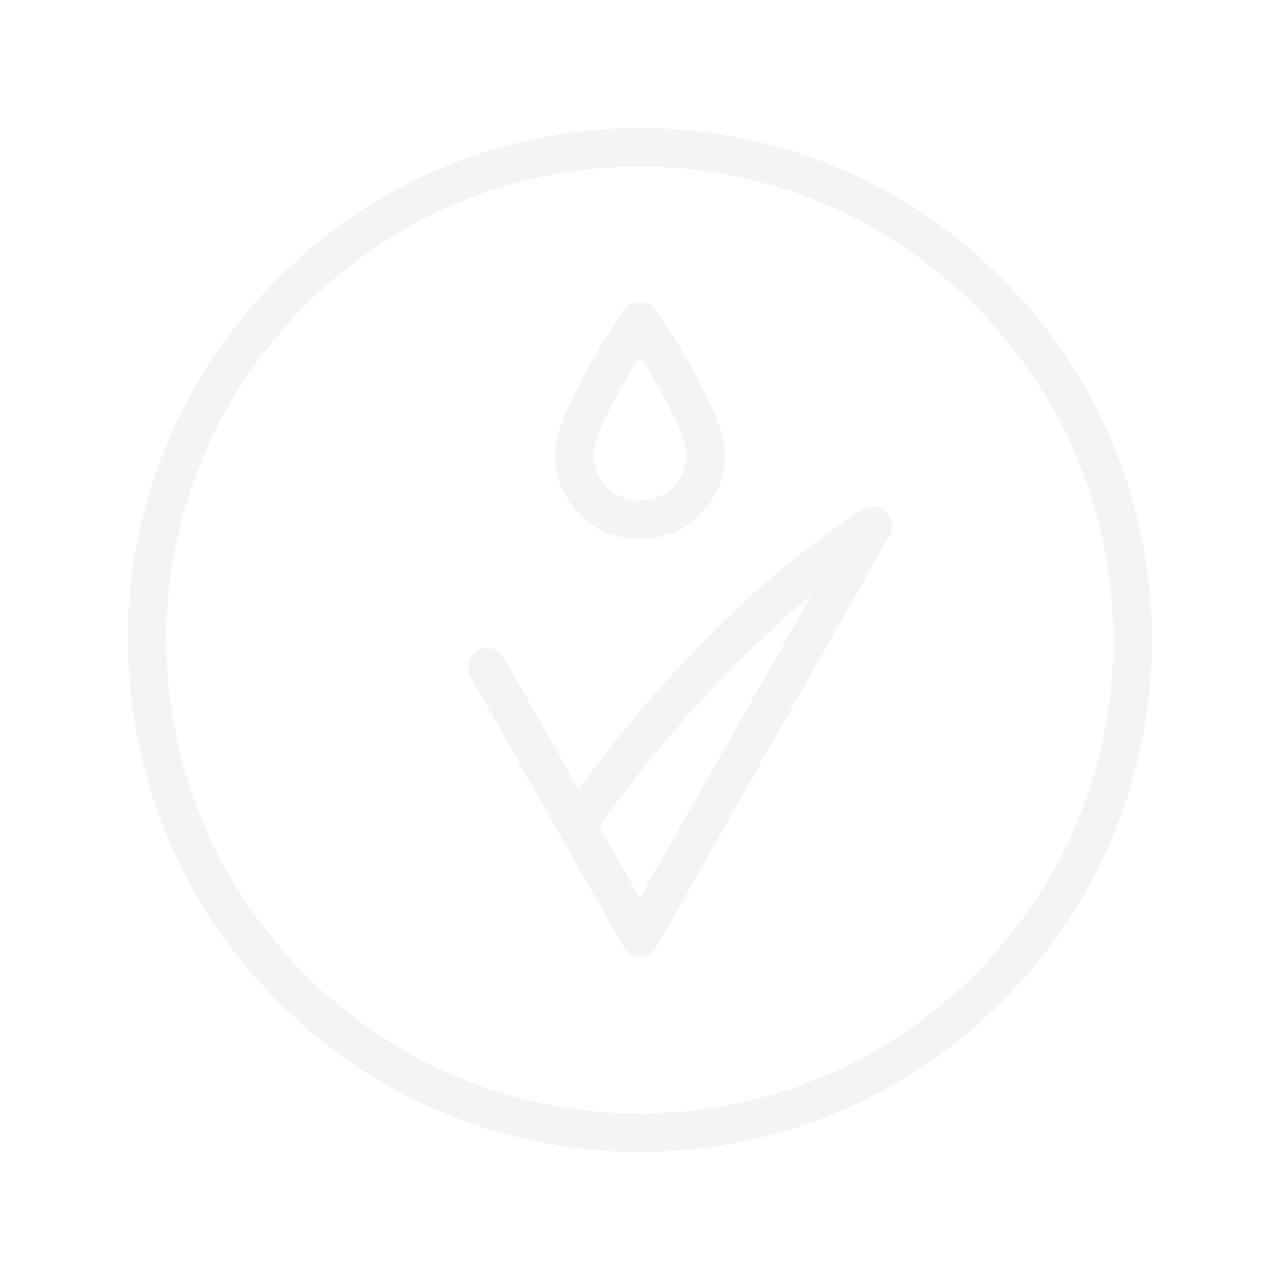 MINIGOLD Ice White Earrings